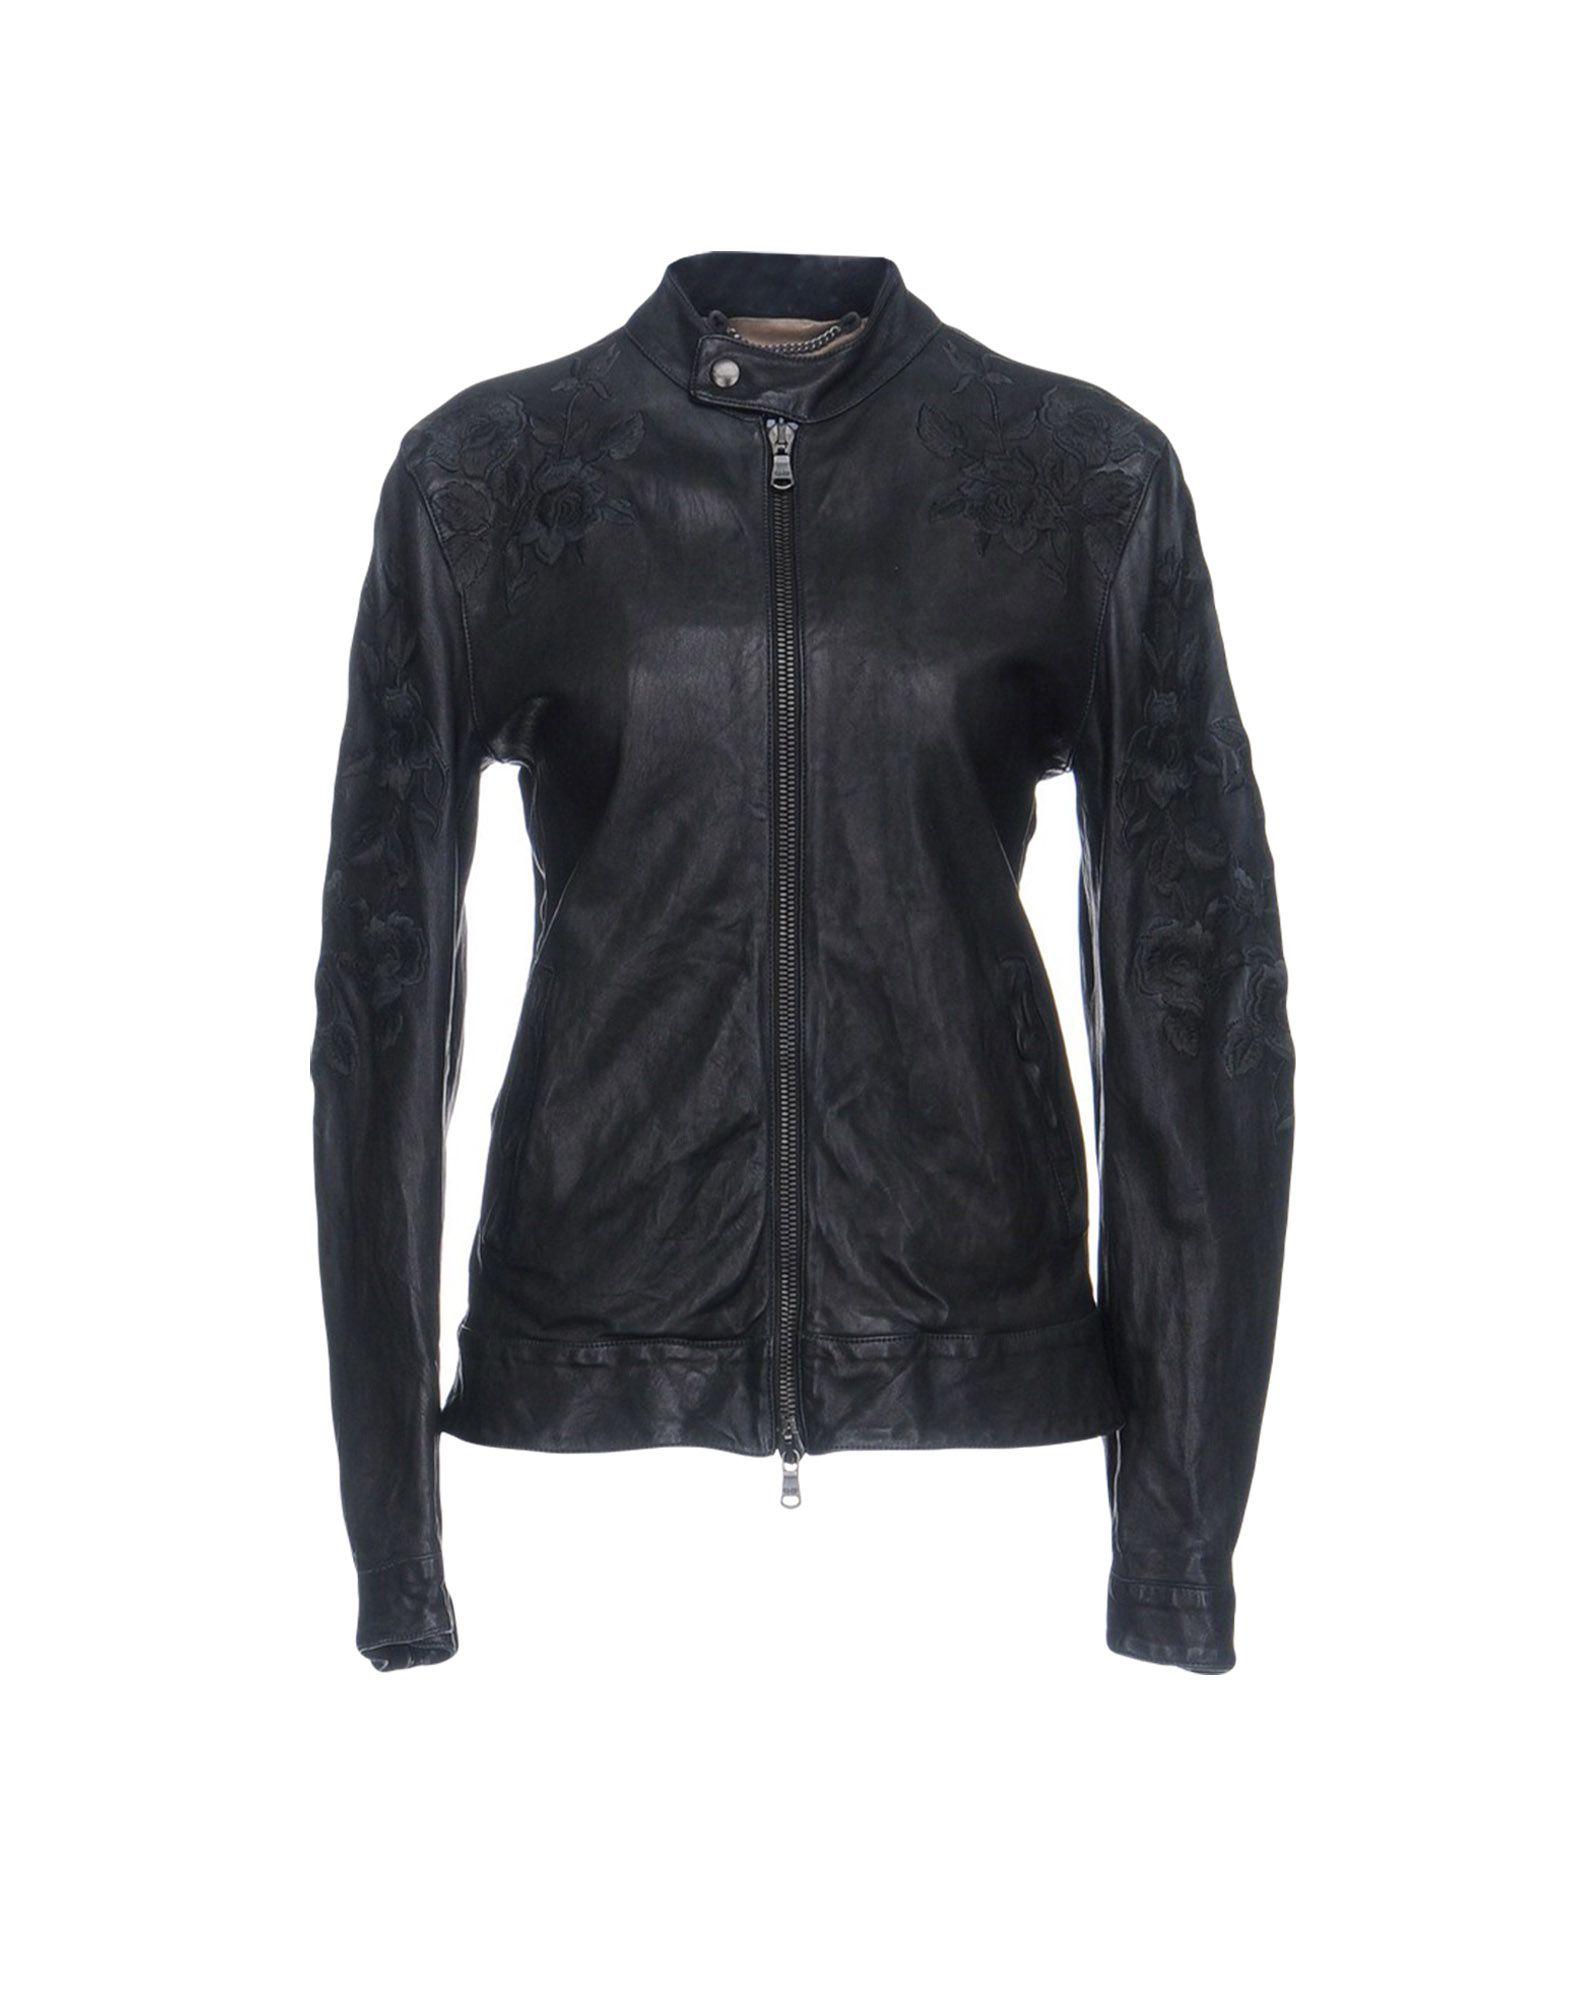 PIHAKAPI Biker Jacket in Steel Grey